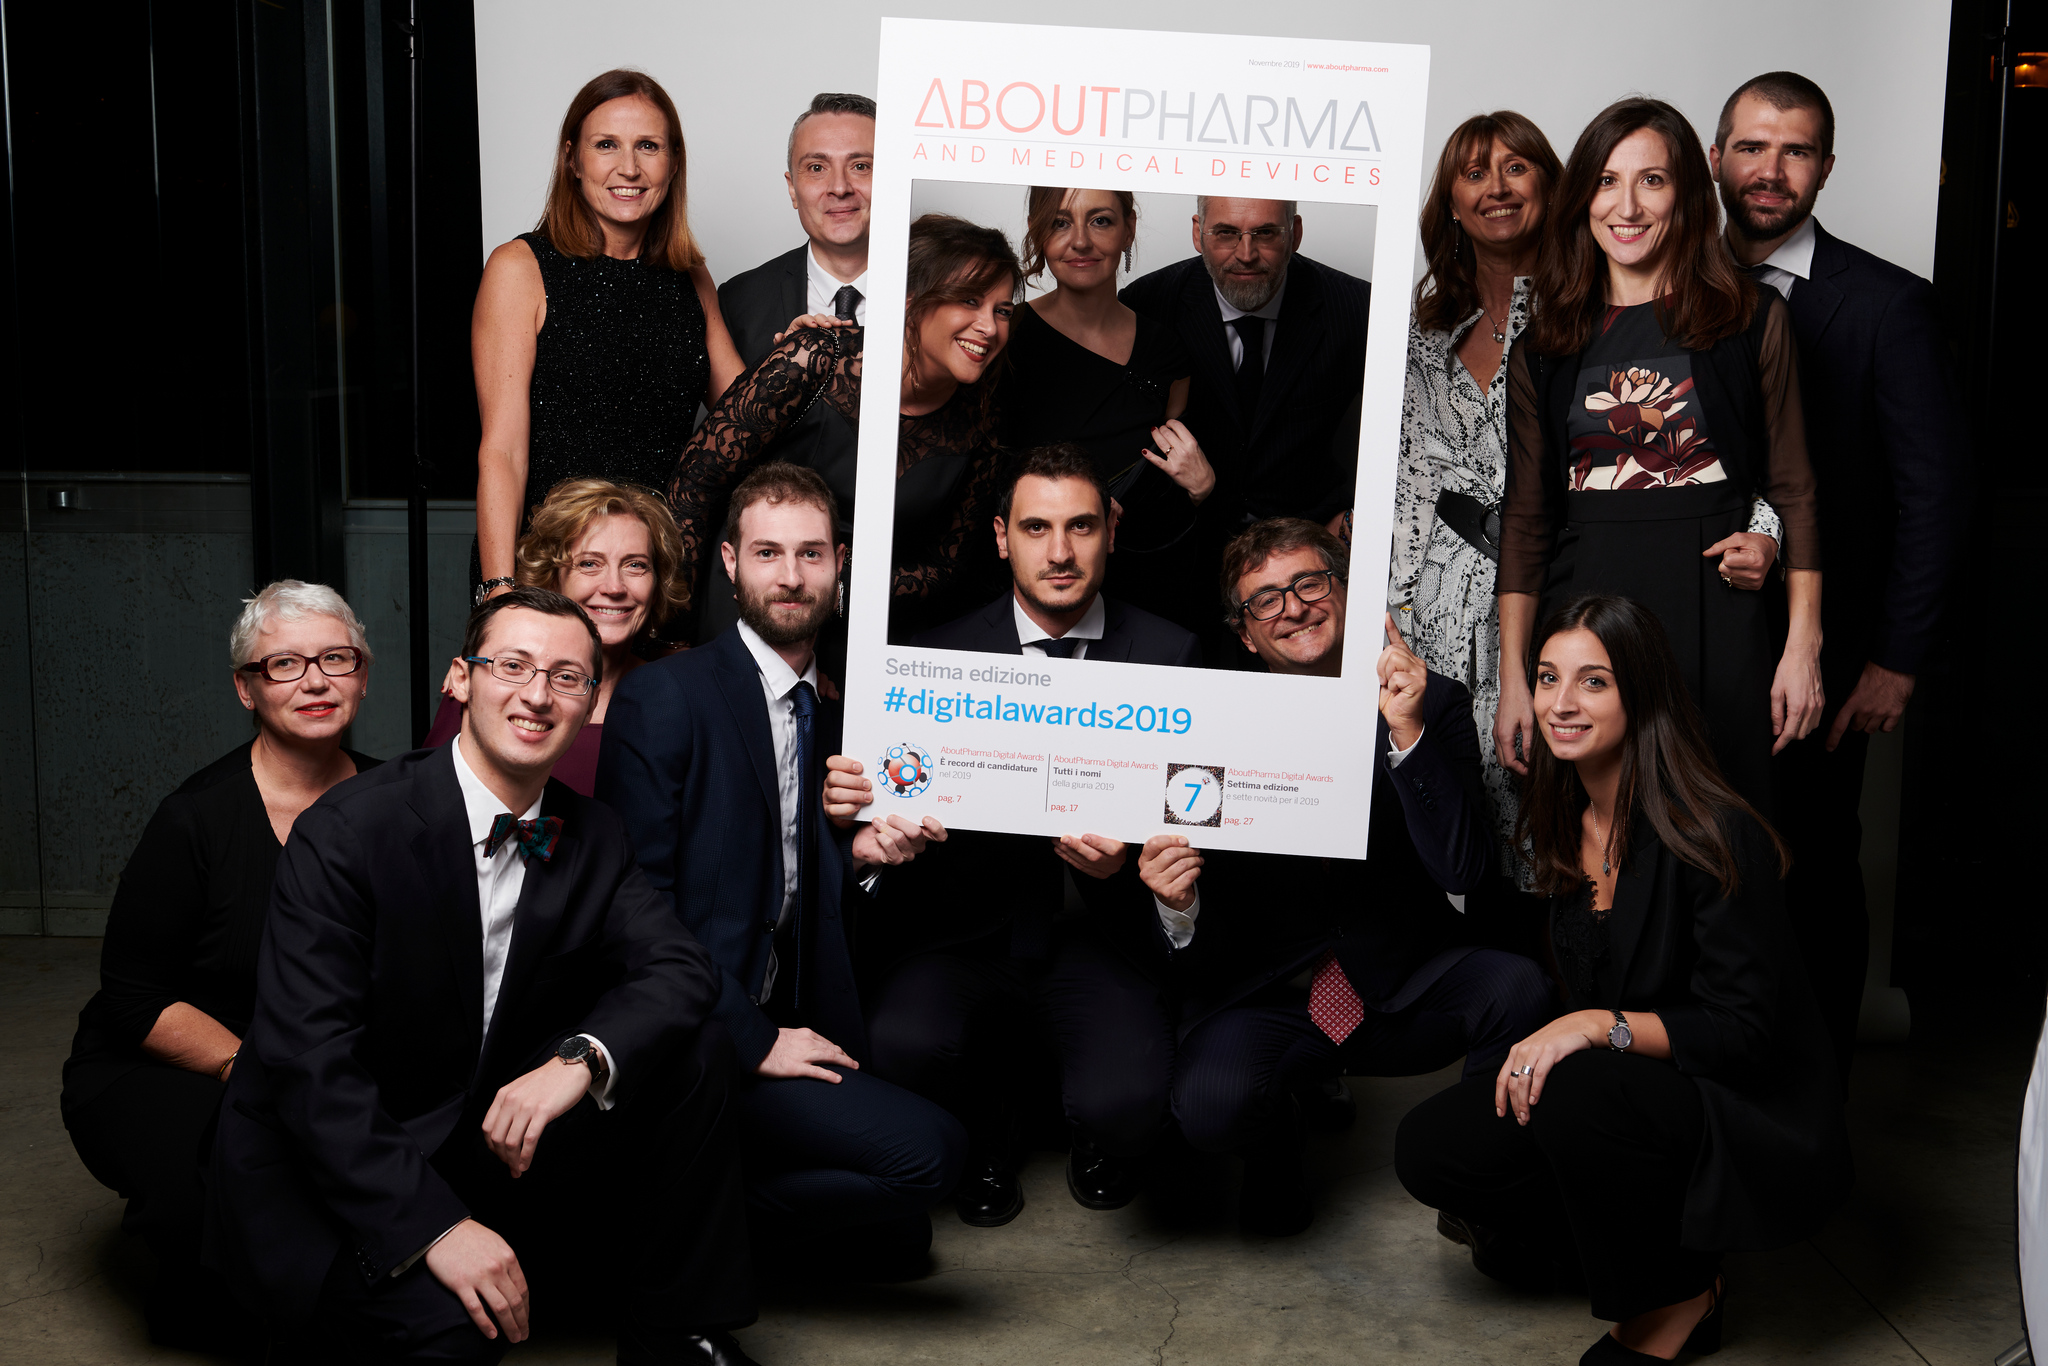 Photobooth AboutPharma Digital Awards 2019_79